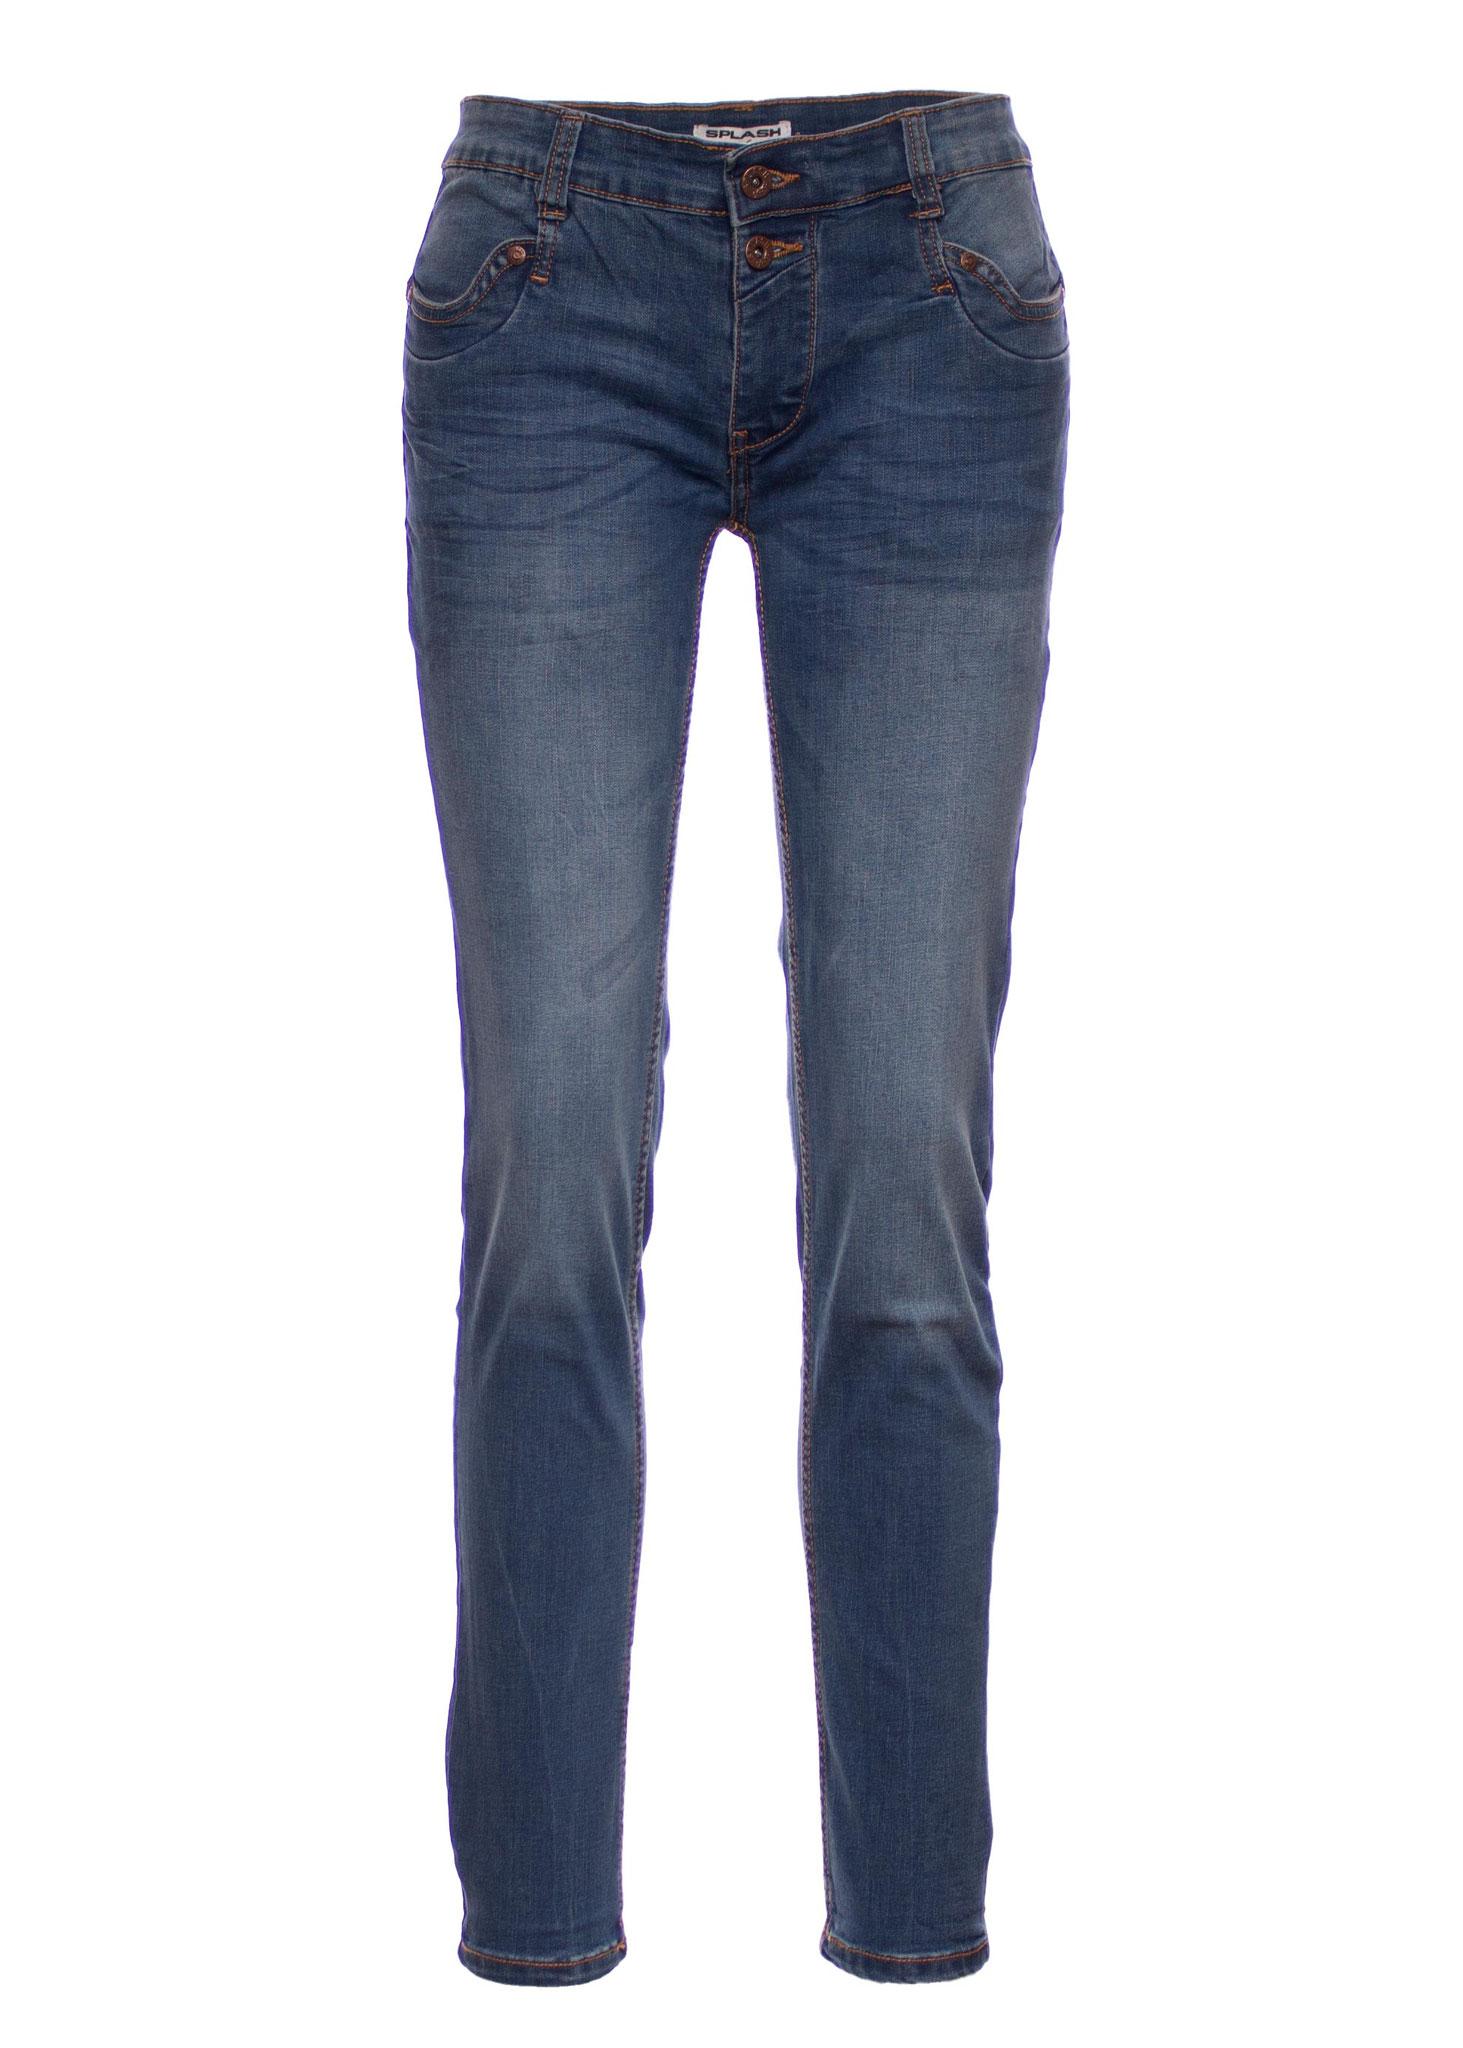 Jeans Doppelknopf 39,99€